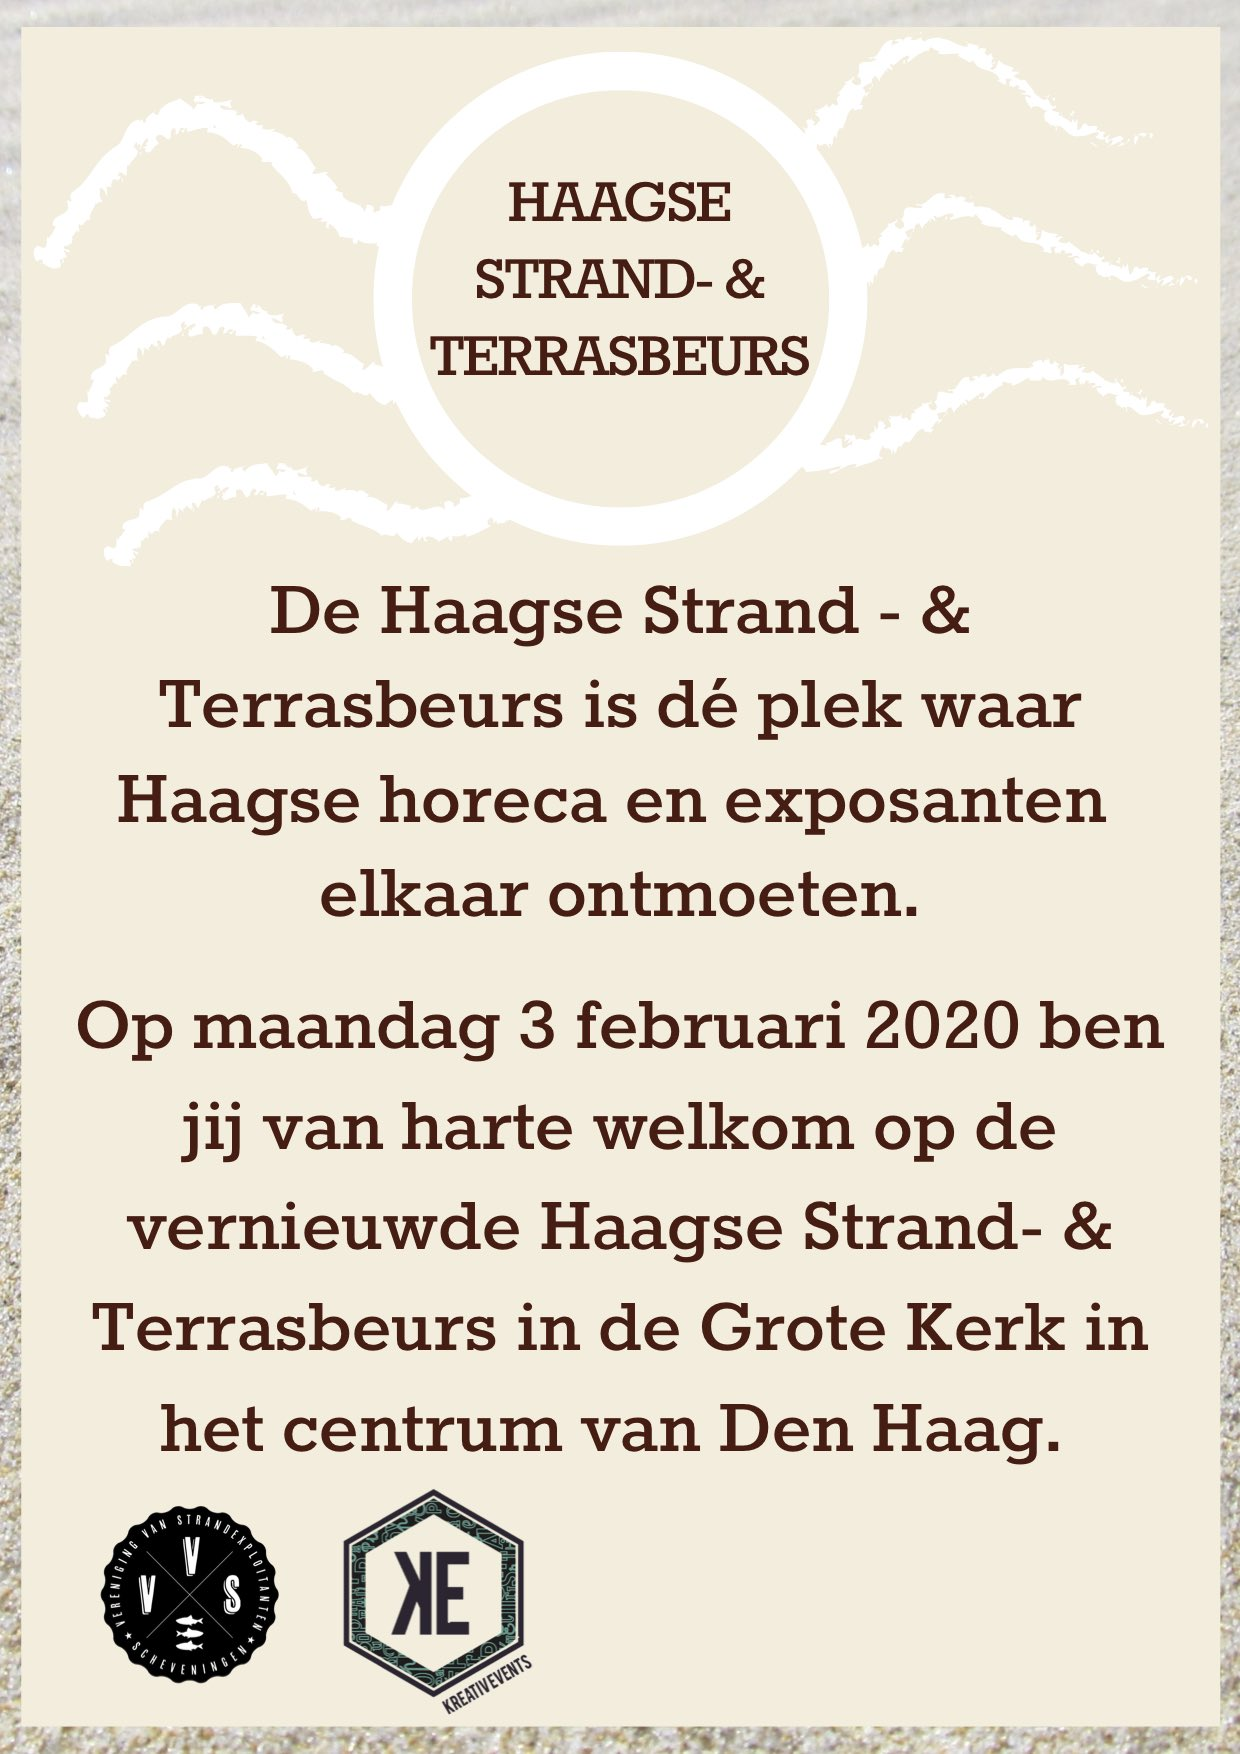 Strandpaviljoenenbeurs 3 februari 2020 13.00 - 17.00 uur Grote Kerk Den Haag